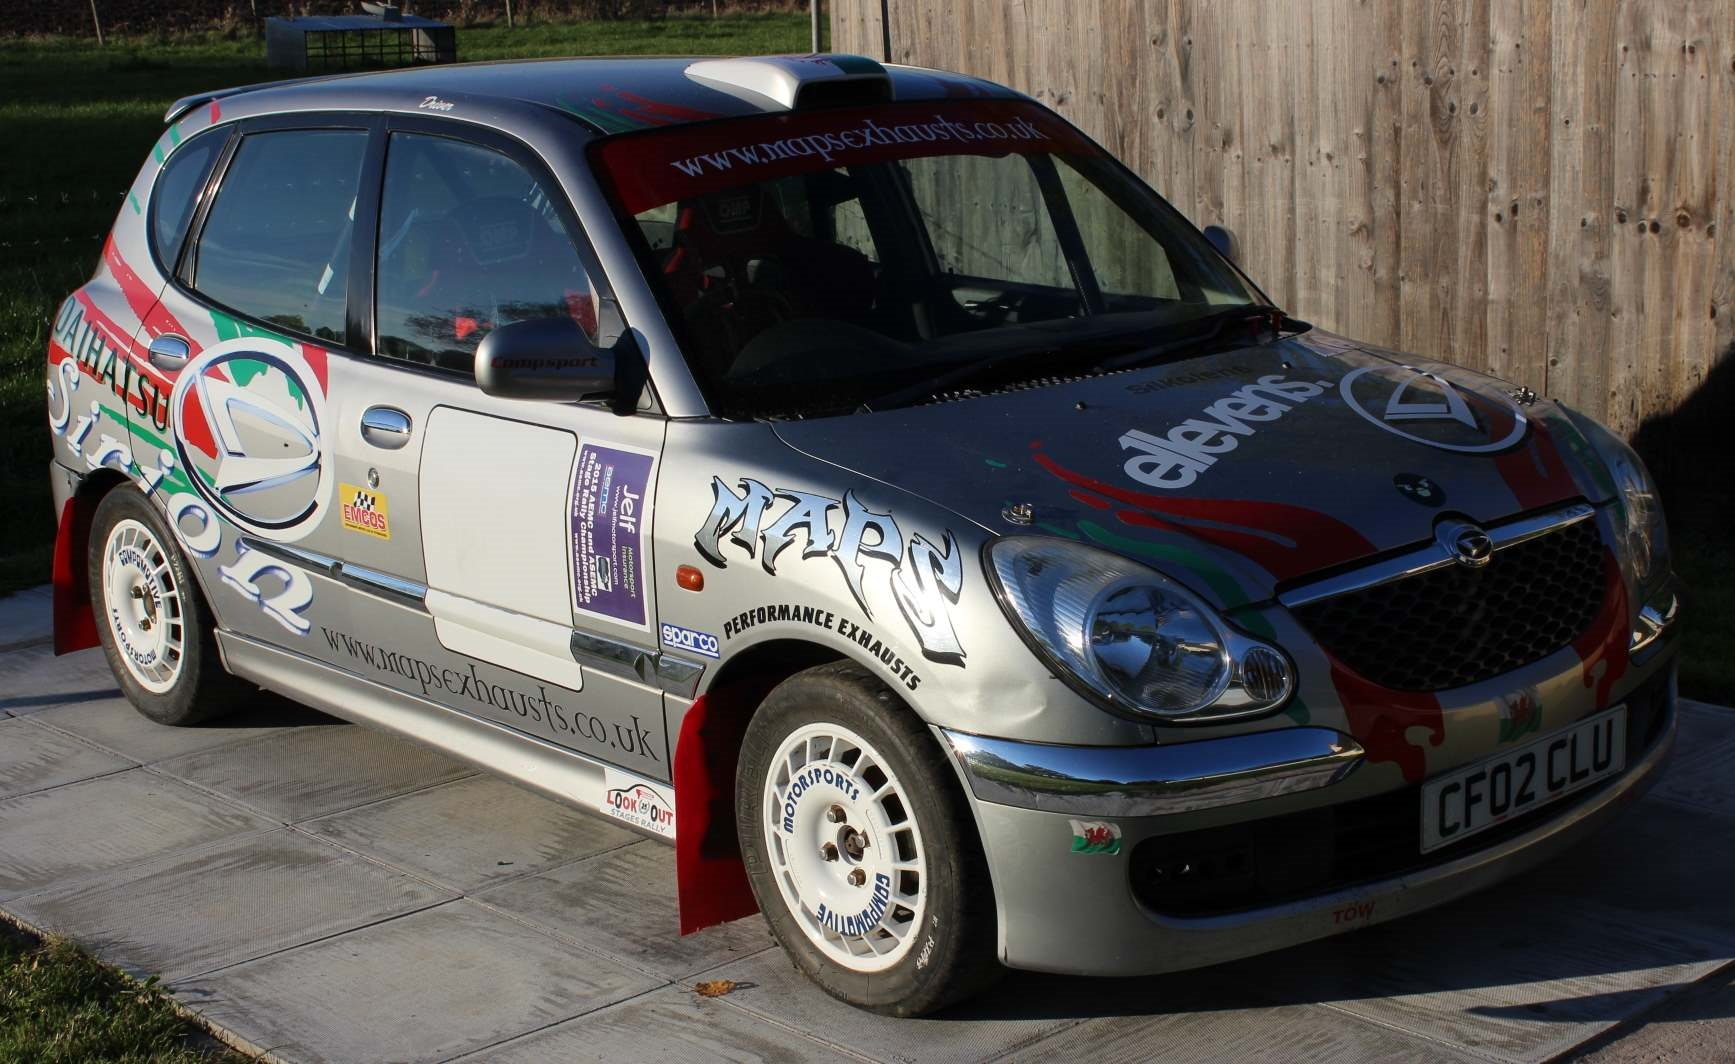 Sirion Rally 2 World Rally Car | Daihatsu Drivers Club UK